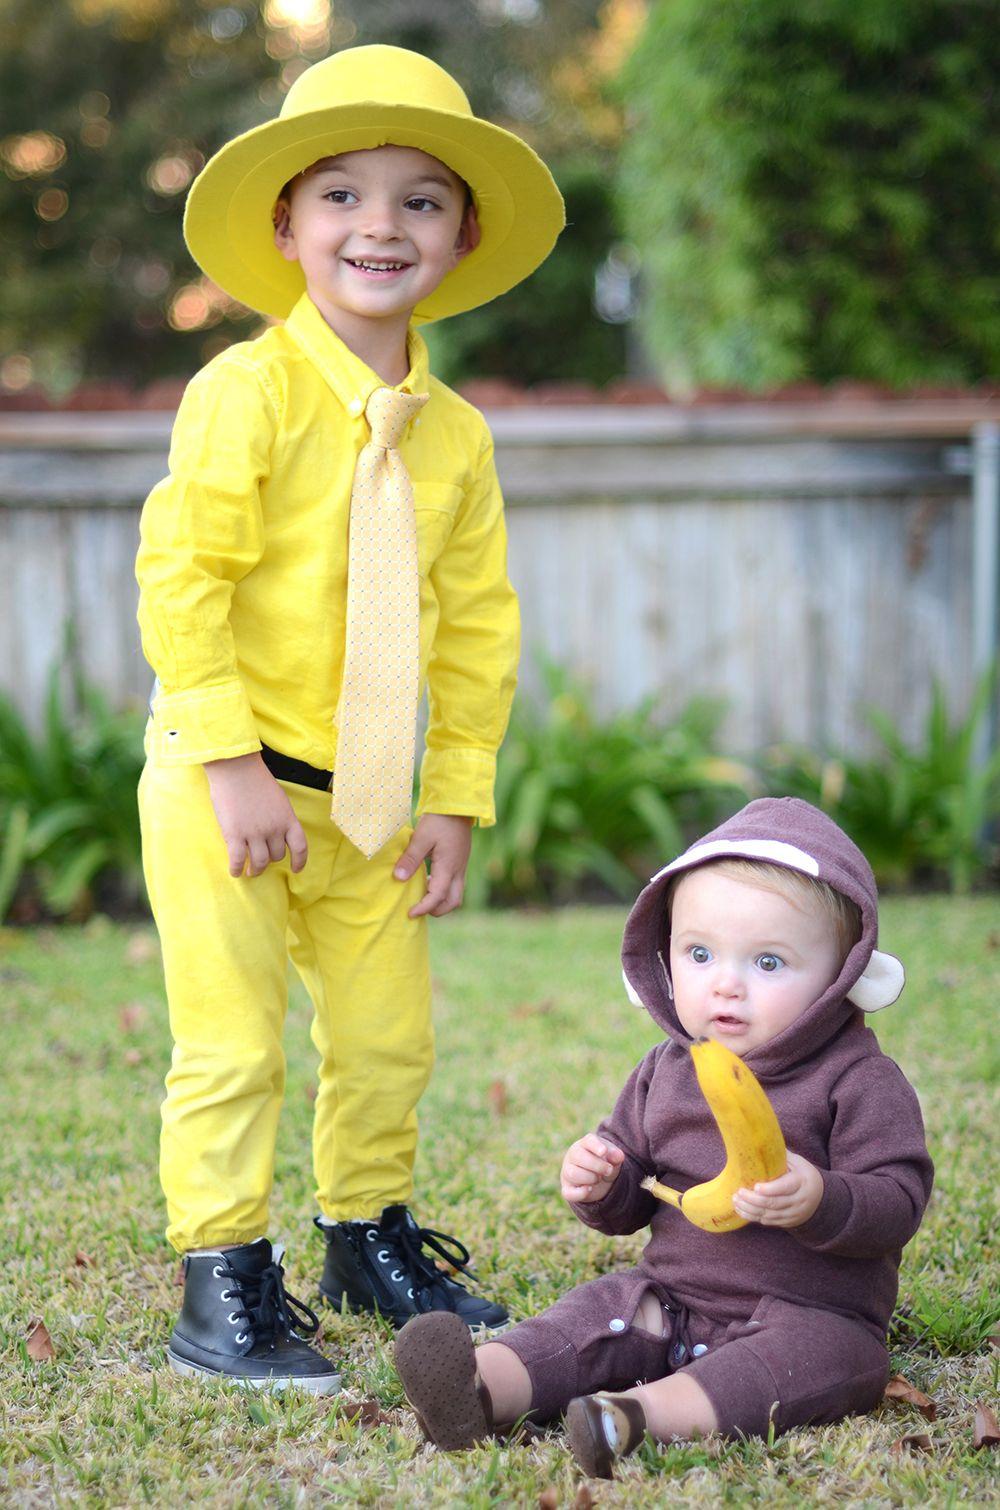 Merrick Halloween Parade 2020 10 DIY Halloween Costumes You Can Make This Month | Merrick's Art